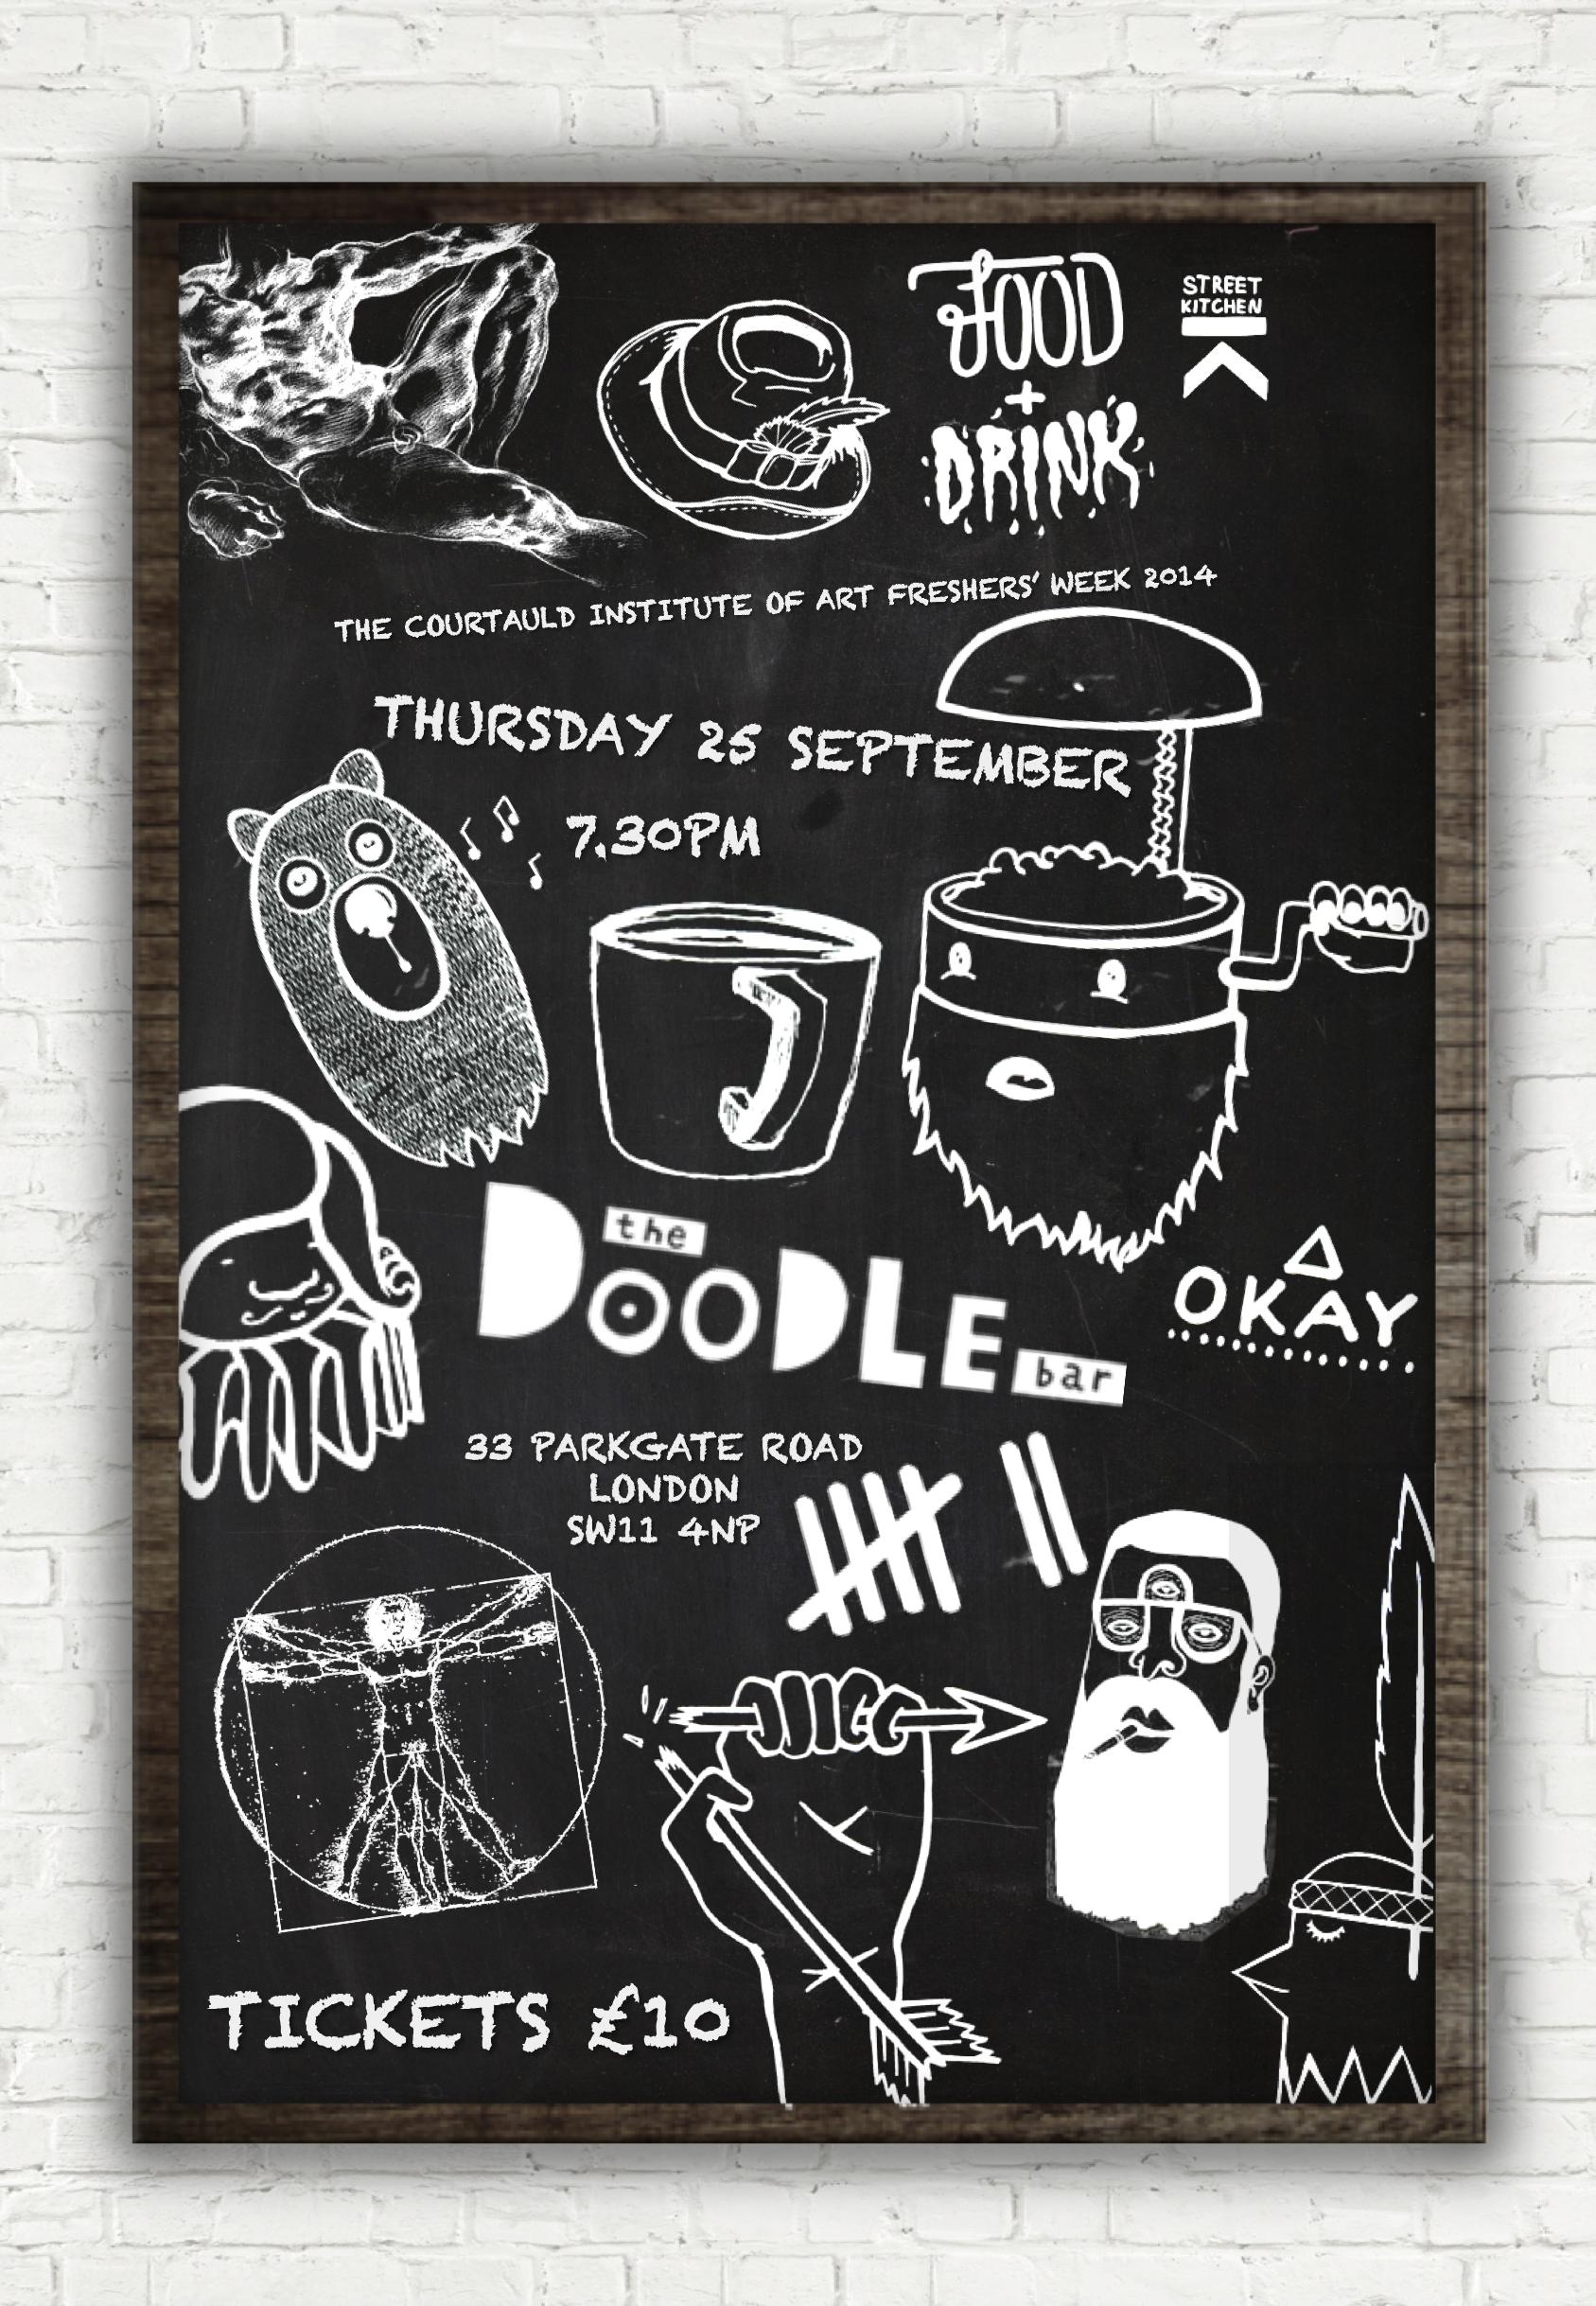 4 Thursday 1 Doodle Bar